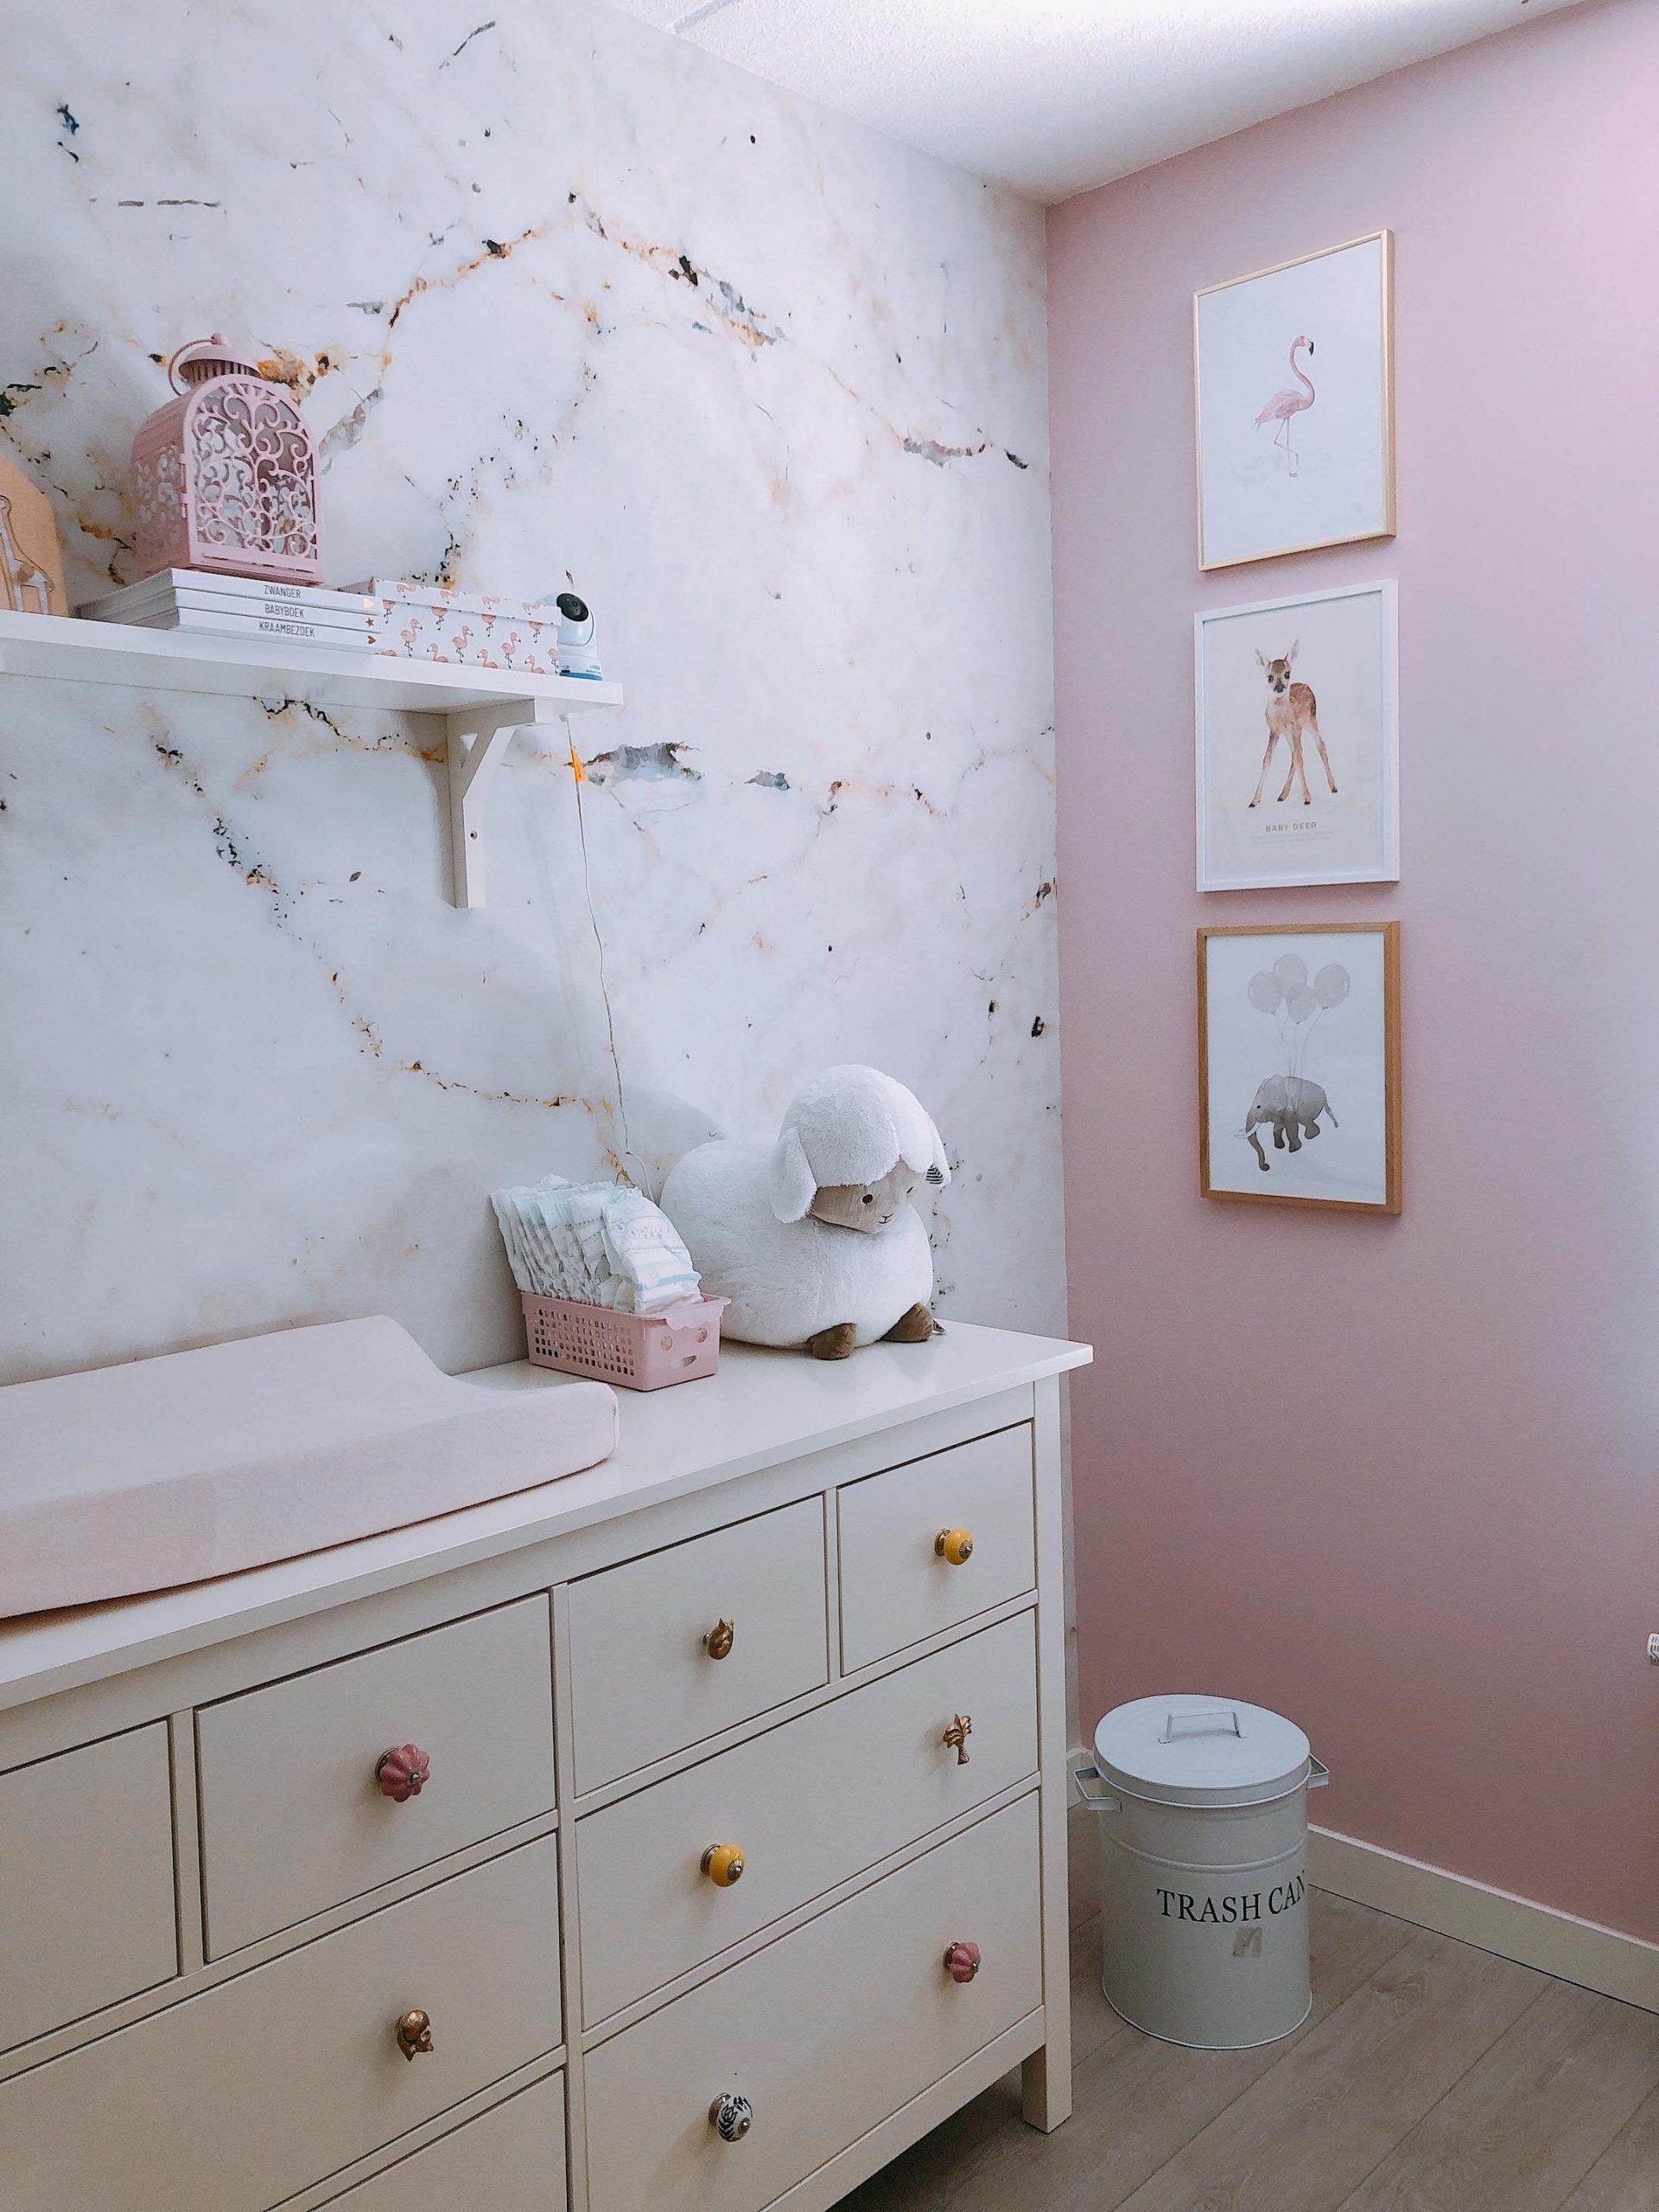 IMG 6908 2160x2880 1 scaled - De baby/kinderkamer van Hazel - roze, hout & marmer!